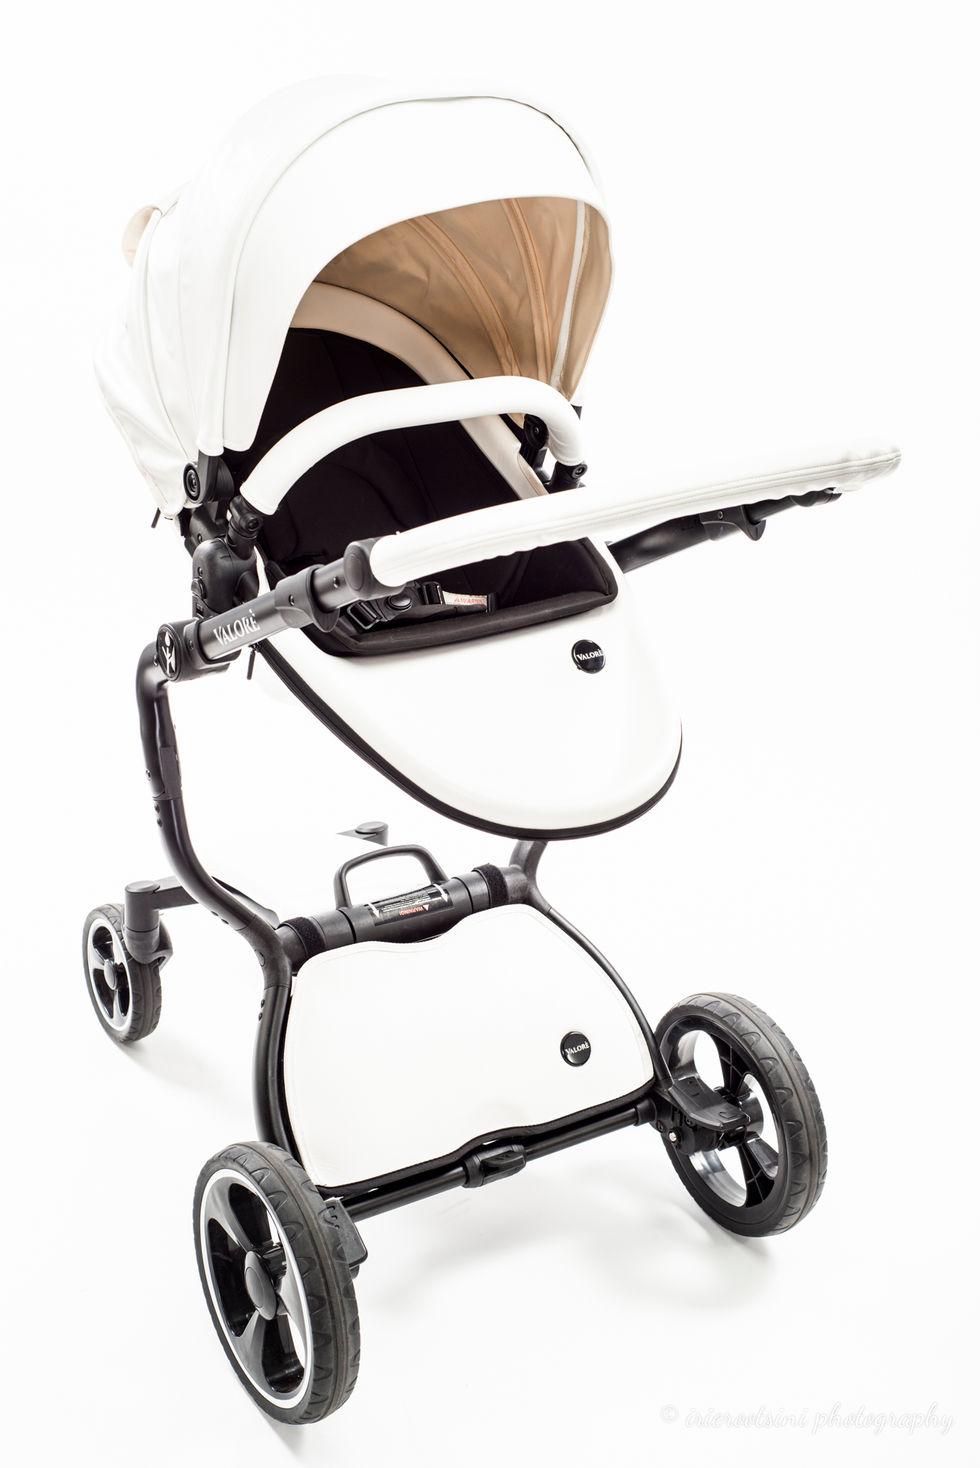 Valore-Strollers-Product-Photographer-Bungarribee-Sydney-3.jpg